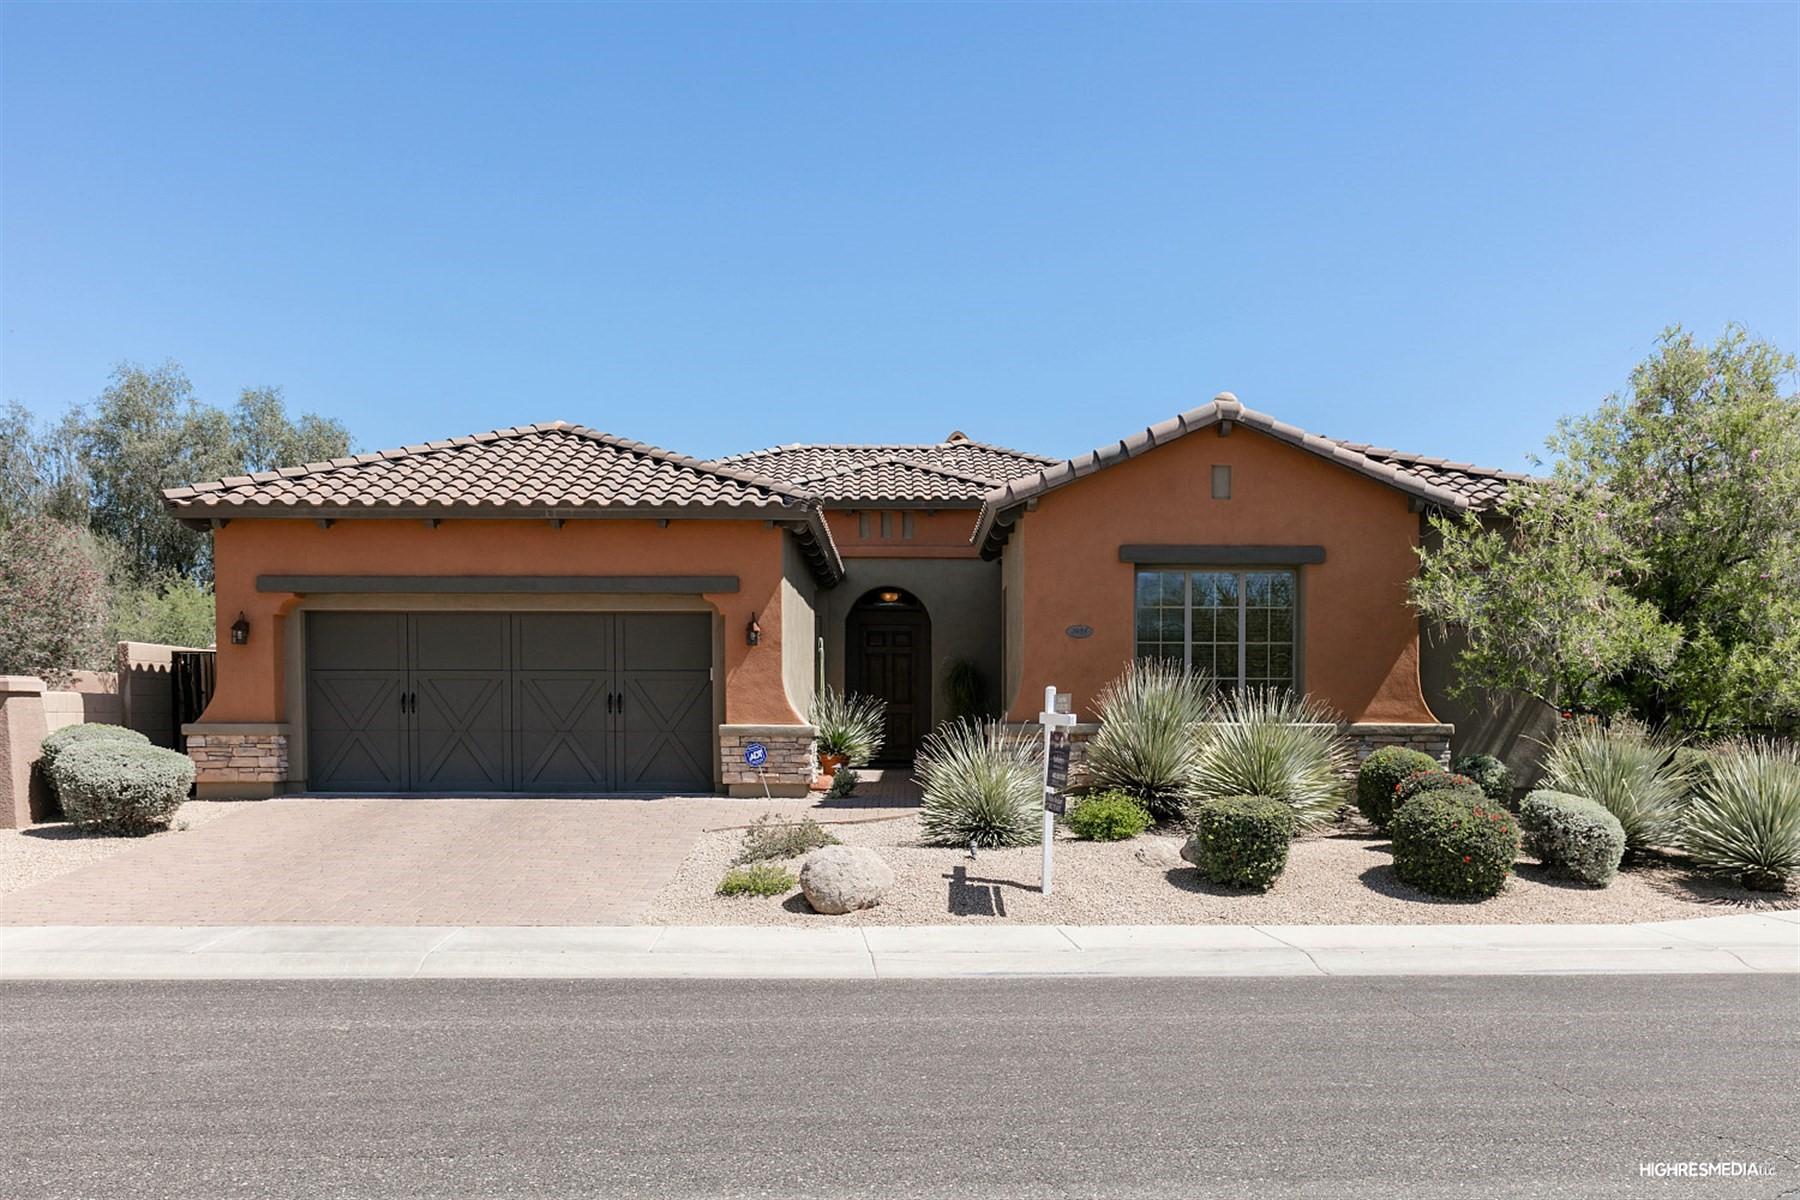 Casa Unifamiliar por un Venta en Desirable single level home in Aviano 3938 E Daley Ln Phoenix, Arizona, 85050 Estados Unidos